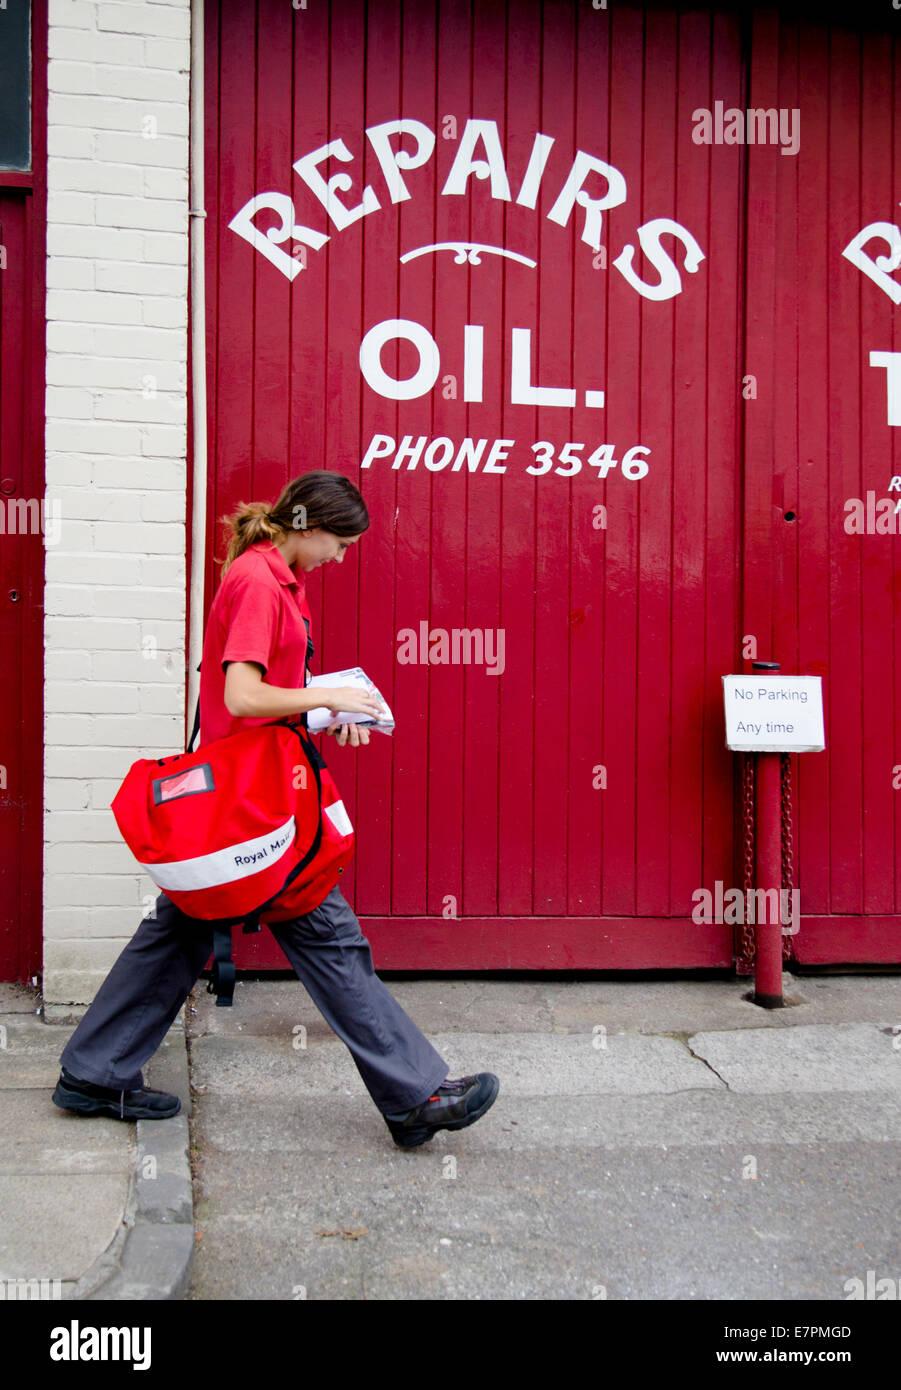 Post woman in red walking past red garage doors in Clifton Bristol UK - Stock Image